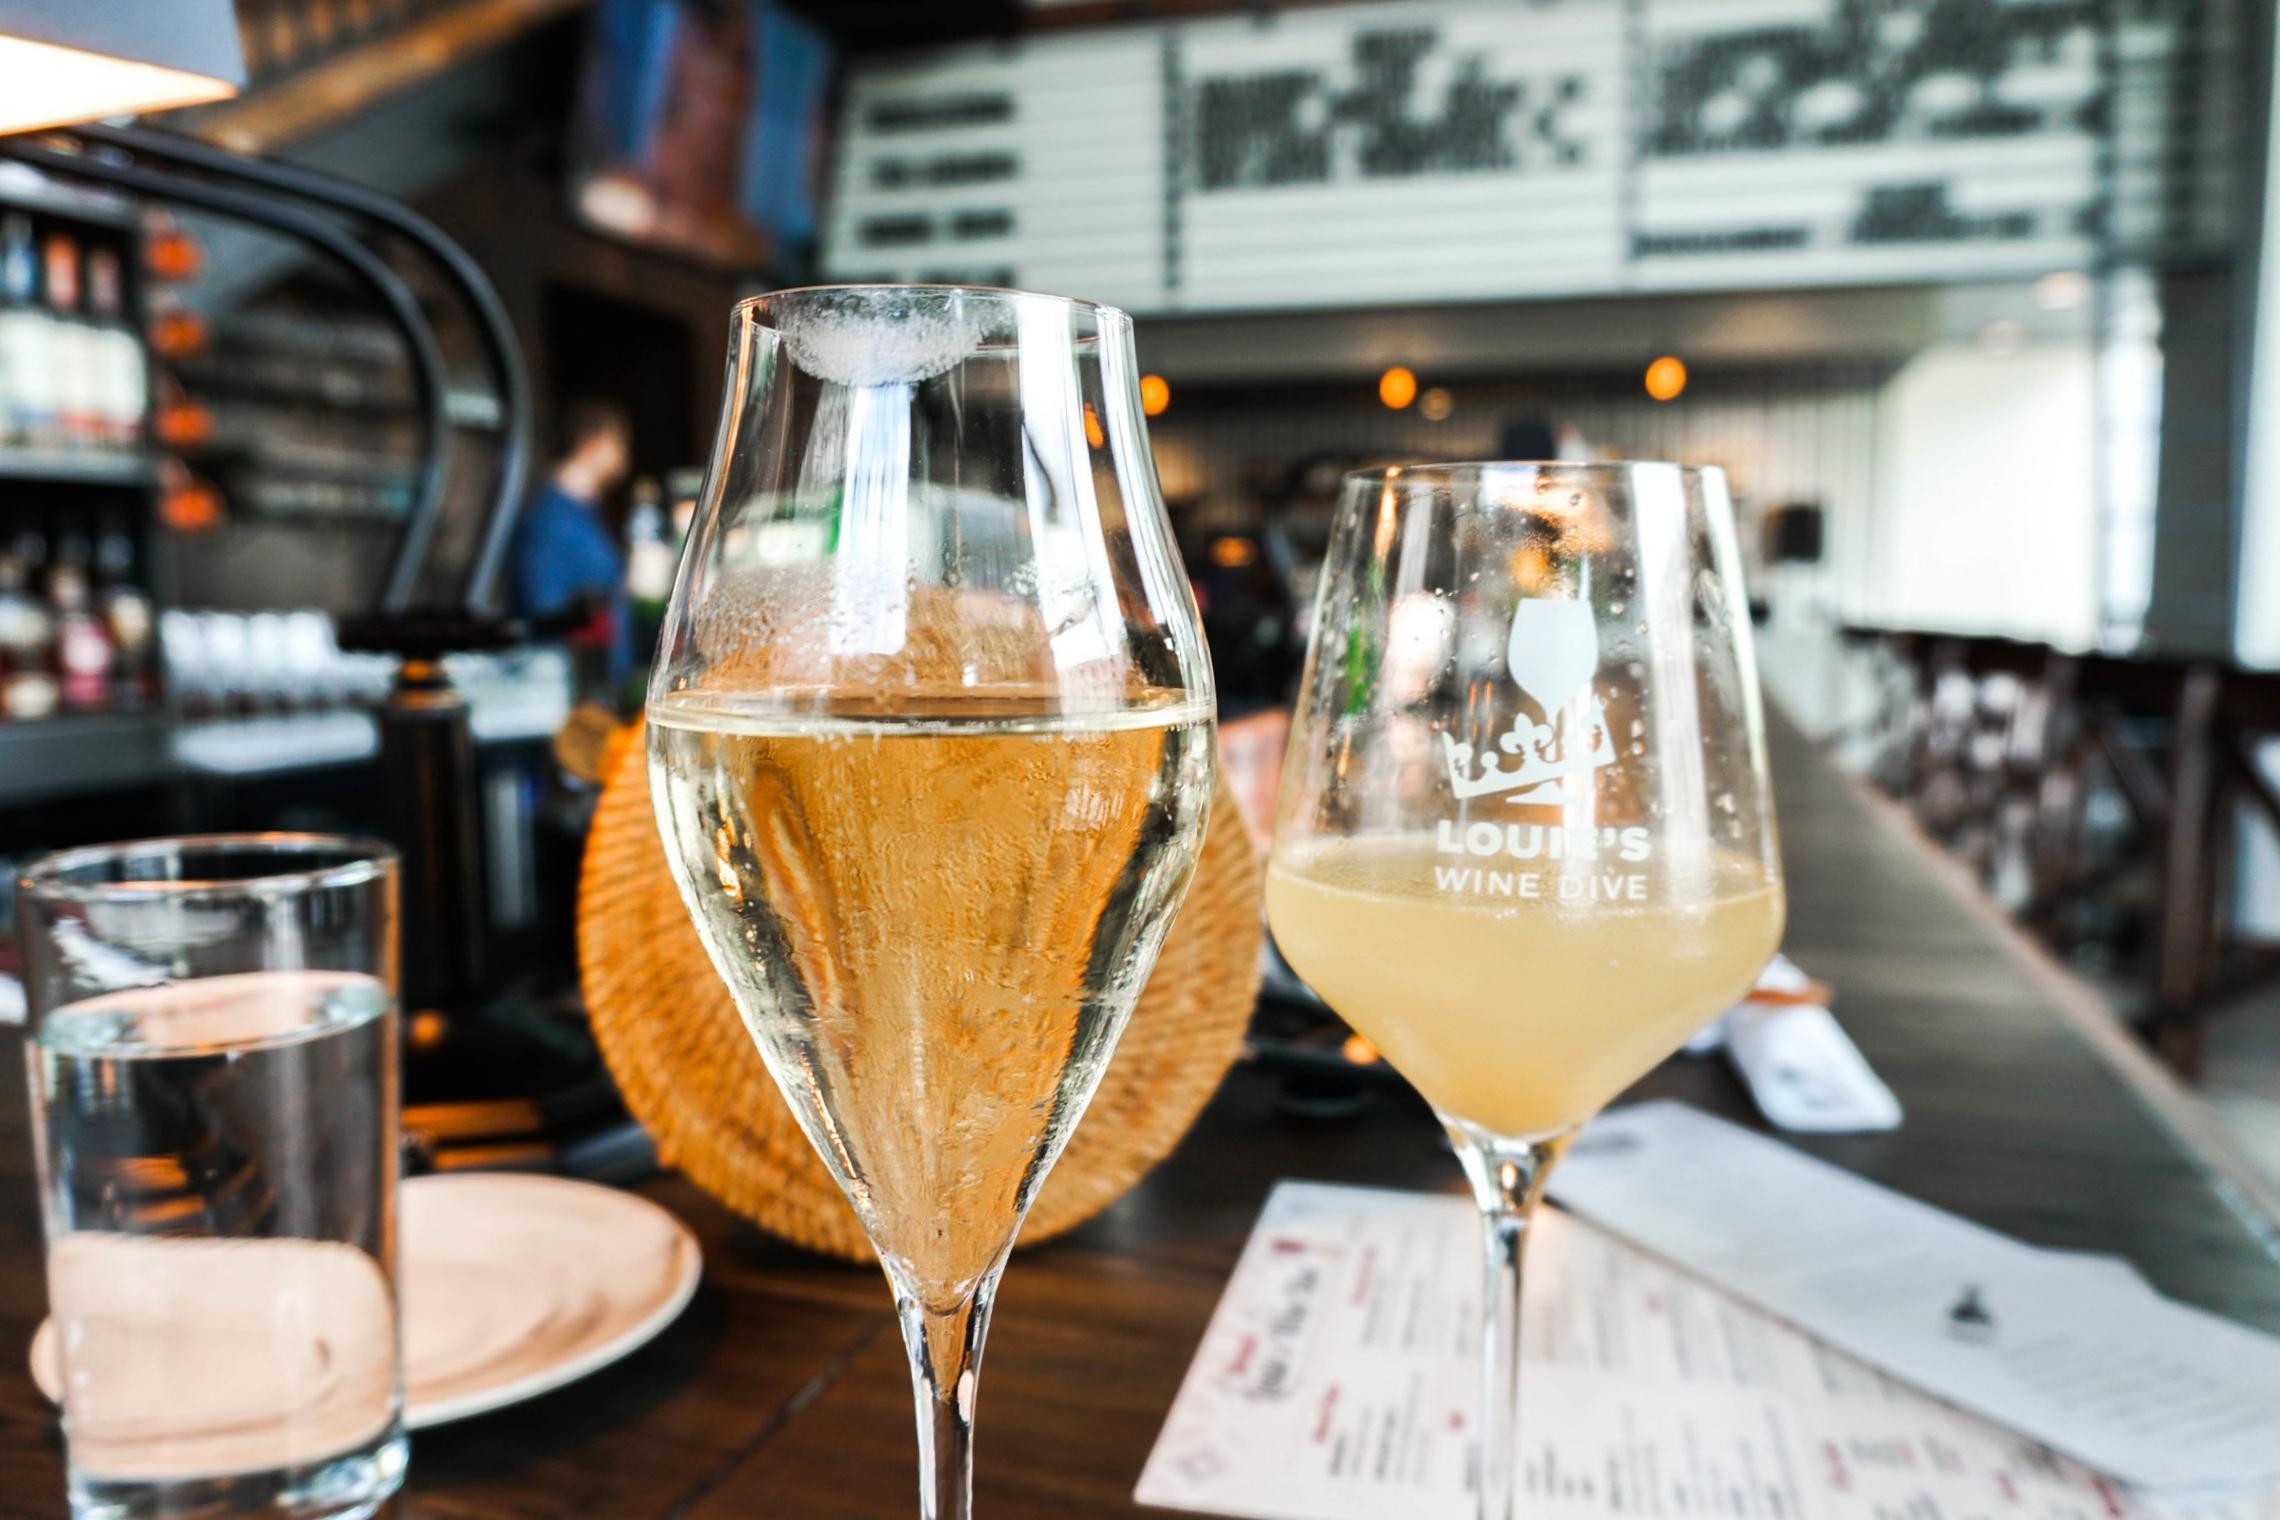 louies-wine-dive-nashville.jpg